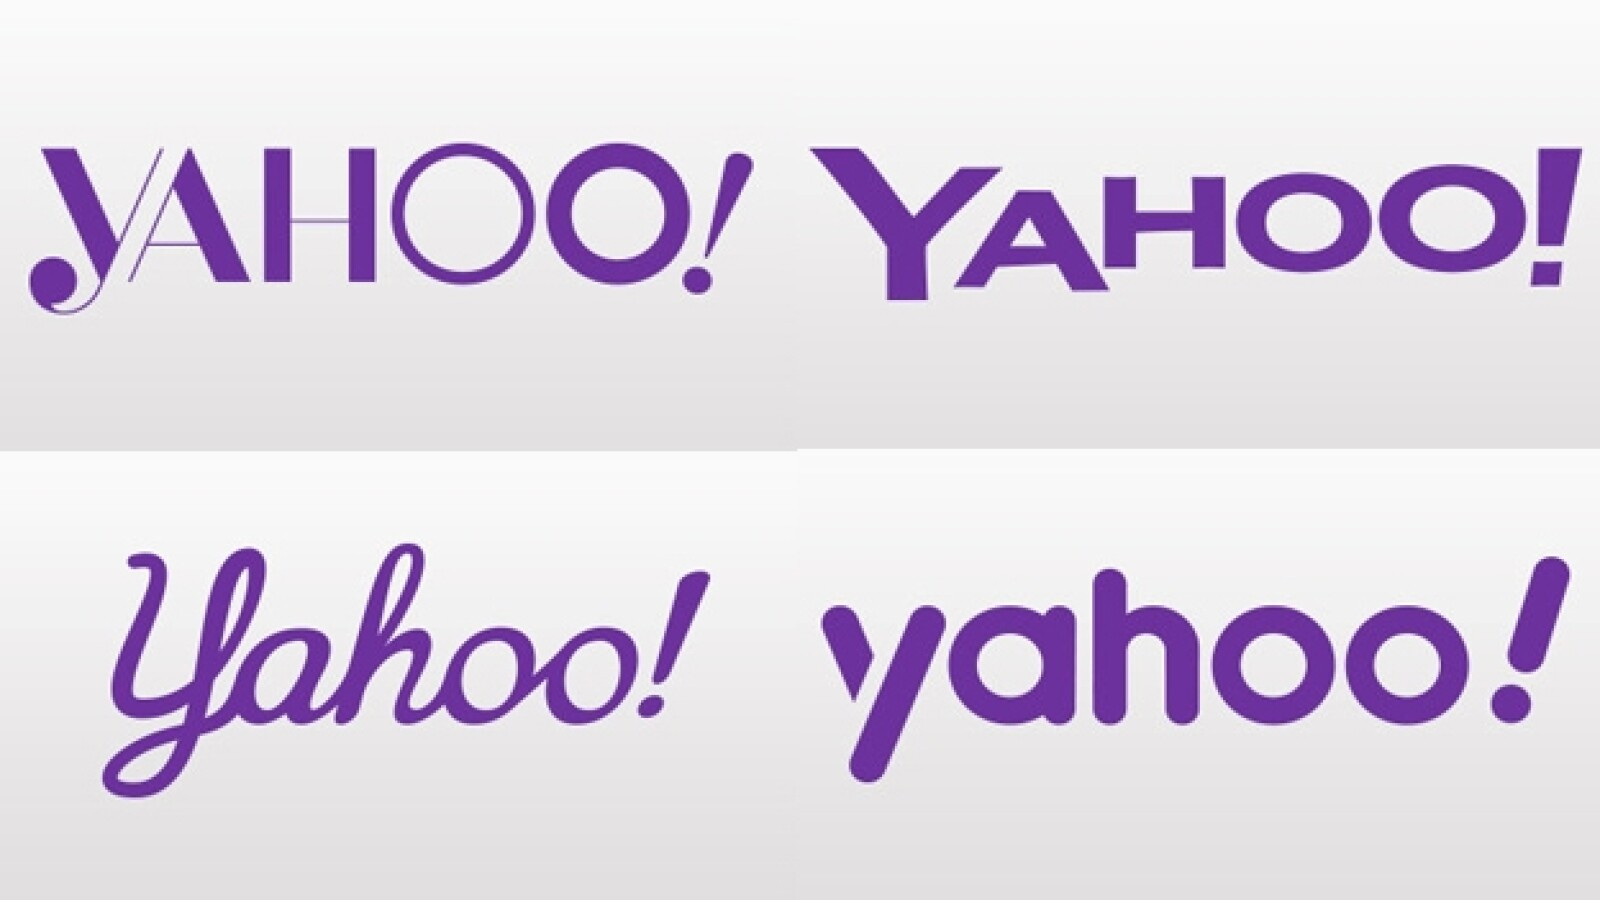 logo de yahoo 2